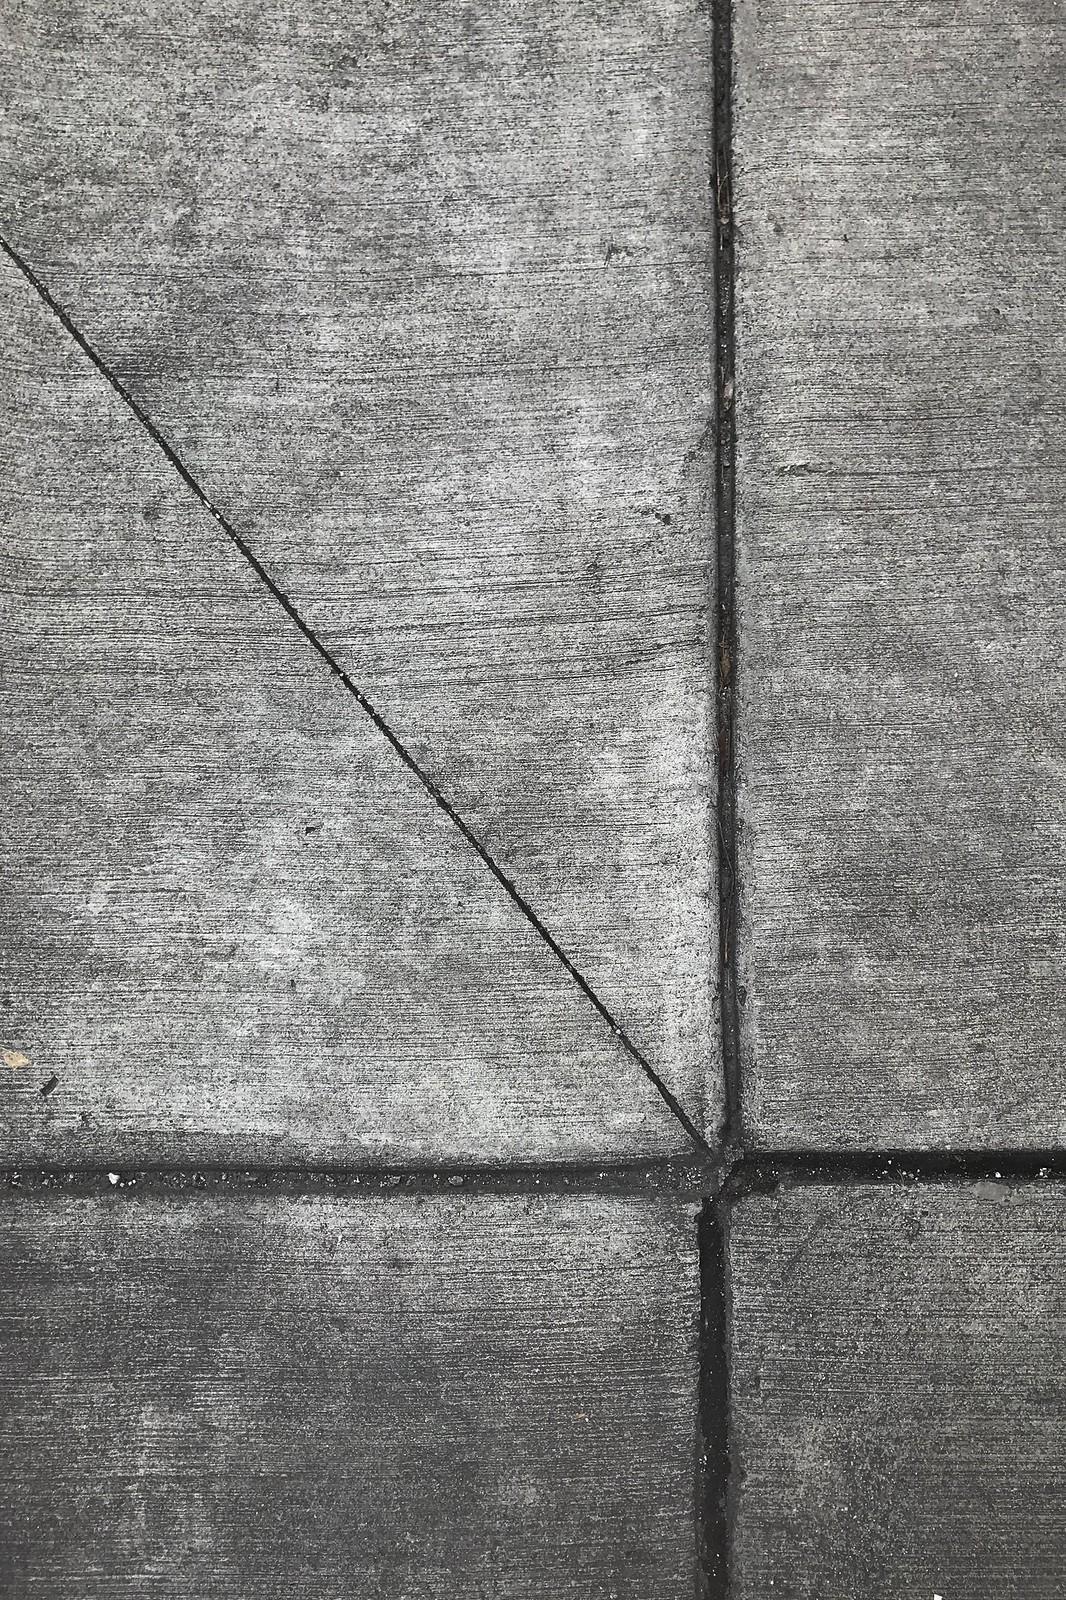 (292/366) Sidewalk Geometry